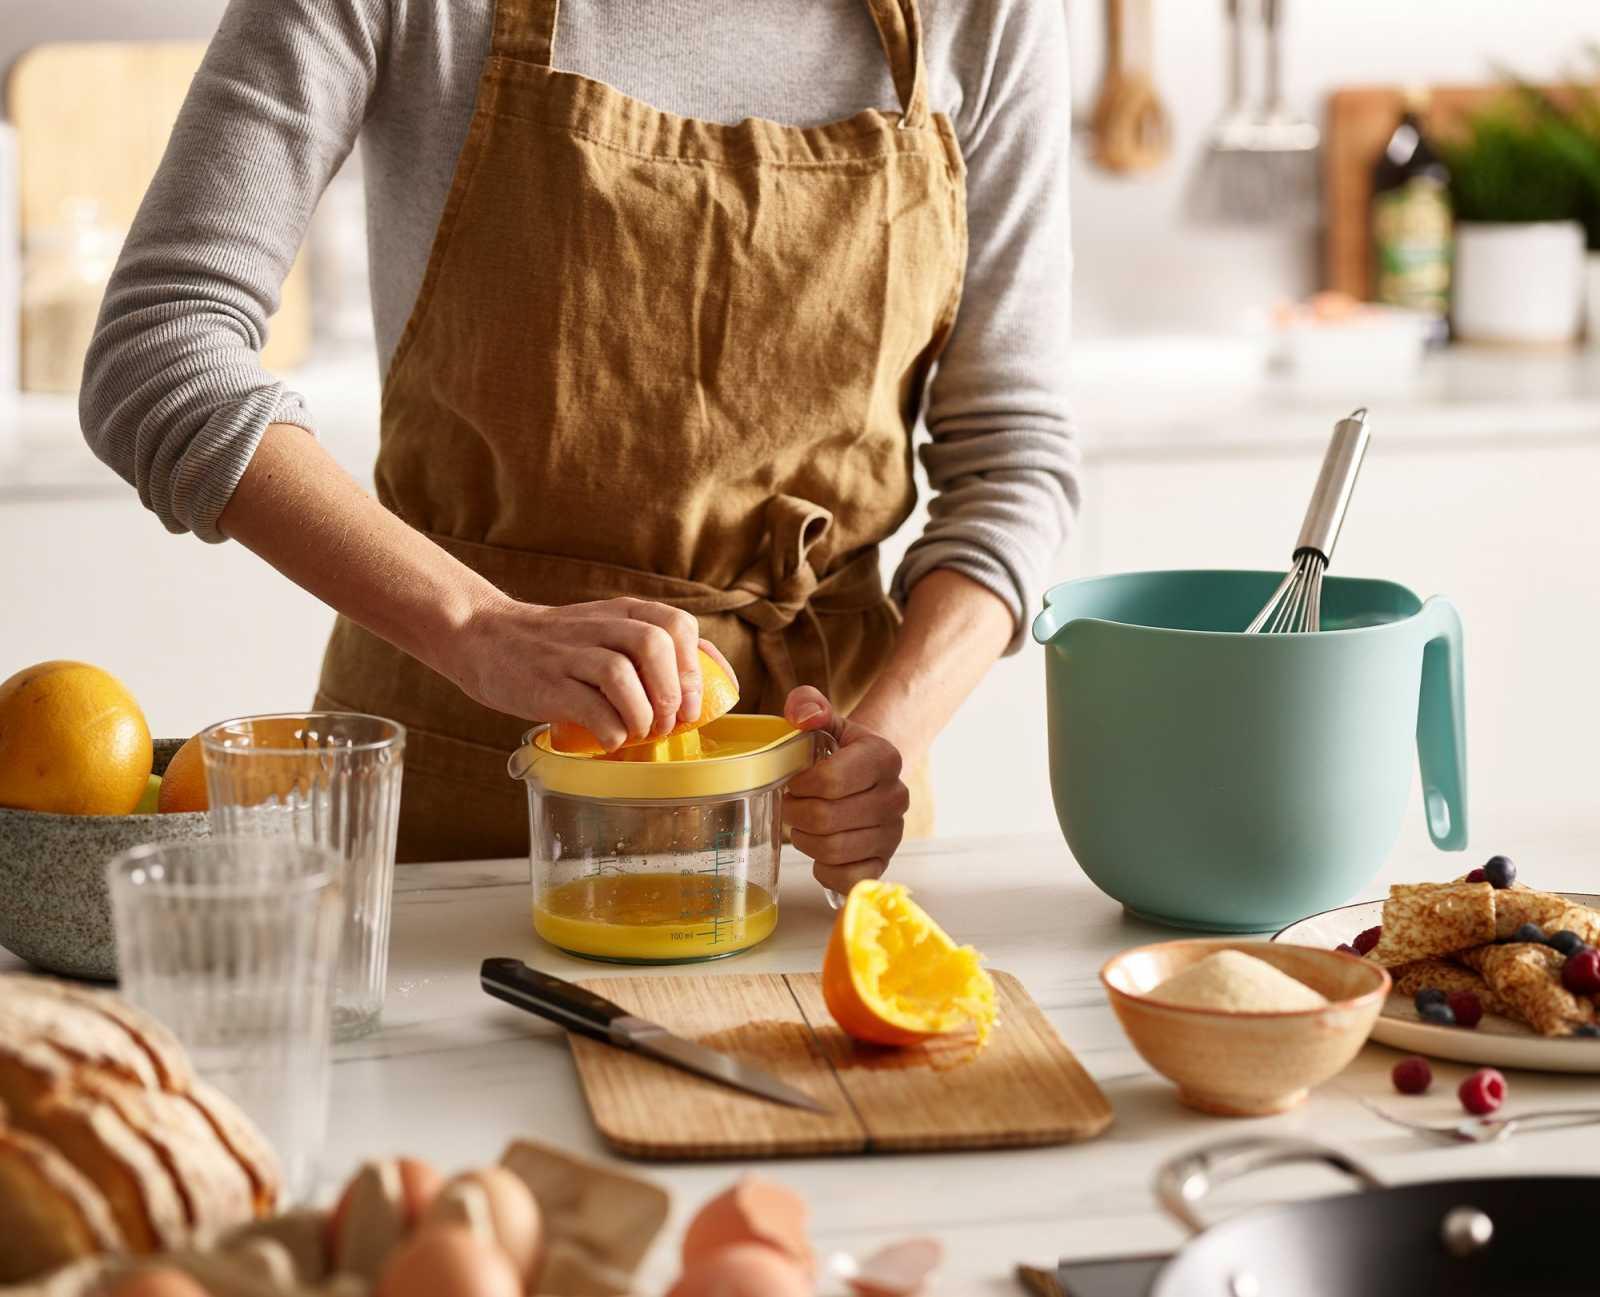 Набор кухонной посуды Joseph Joseph NEST, 3 предмета, желто-голубой Joseph Joseph 40110 фото 4